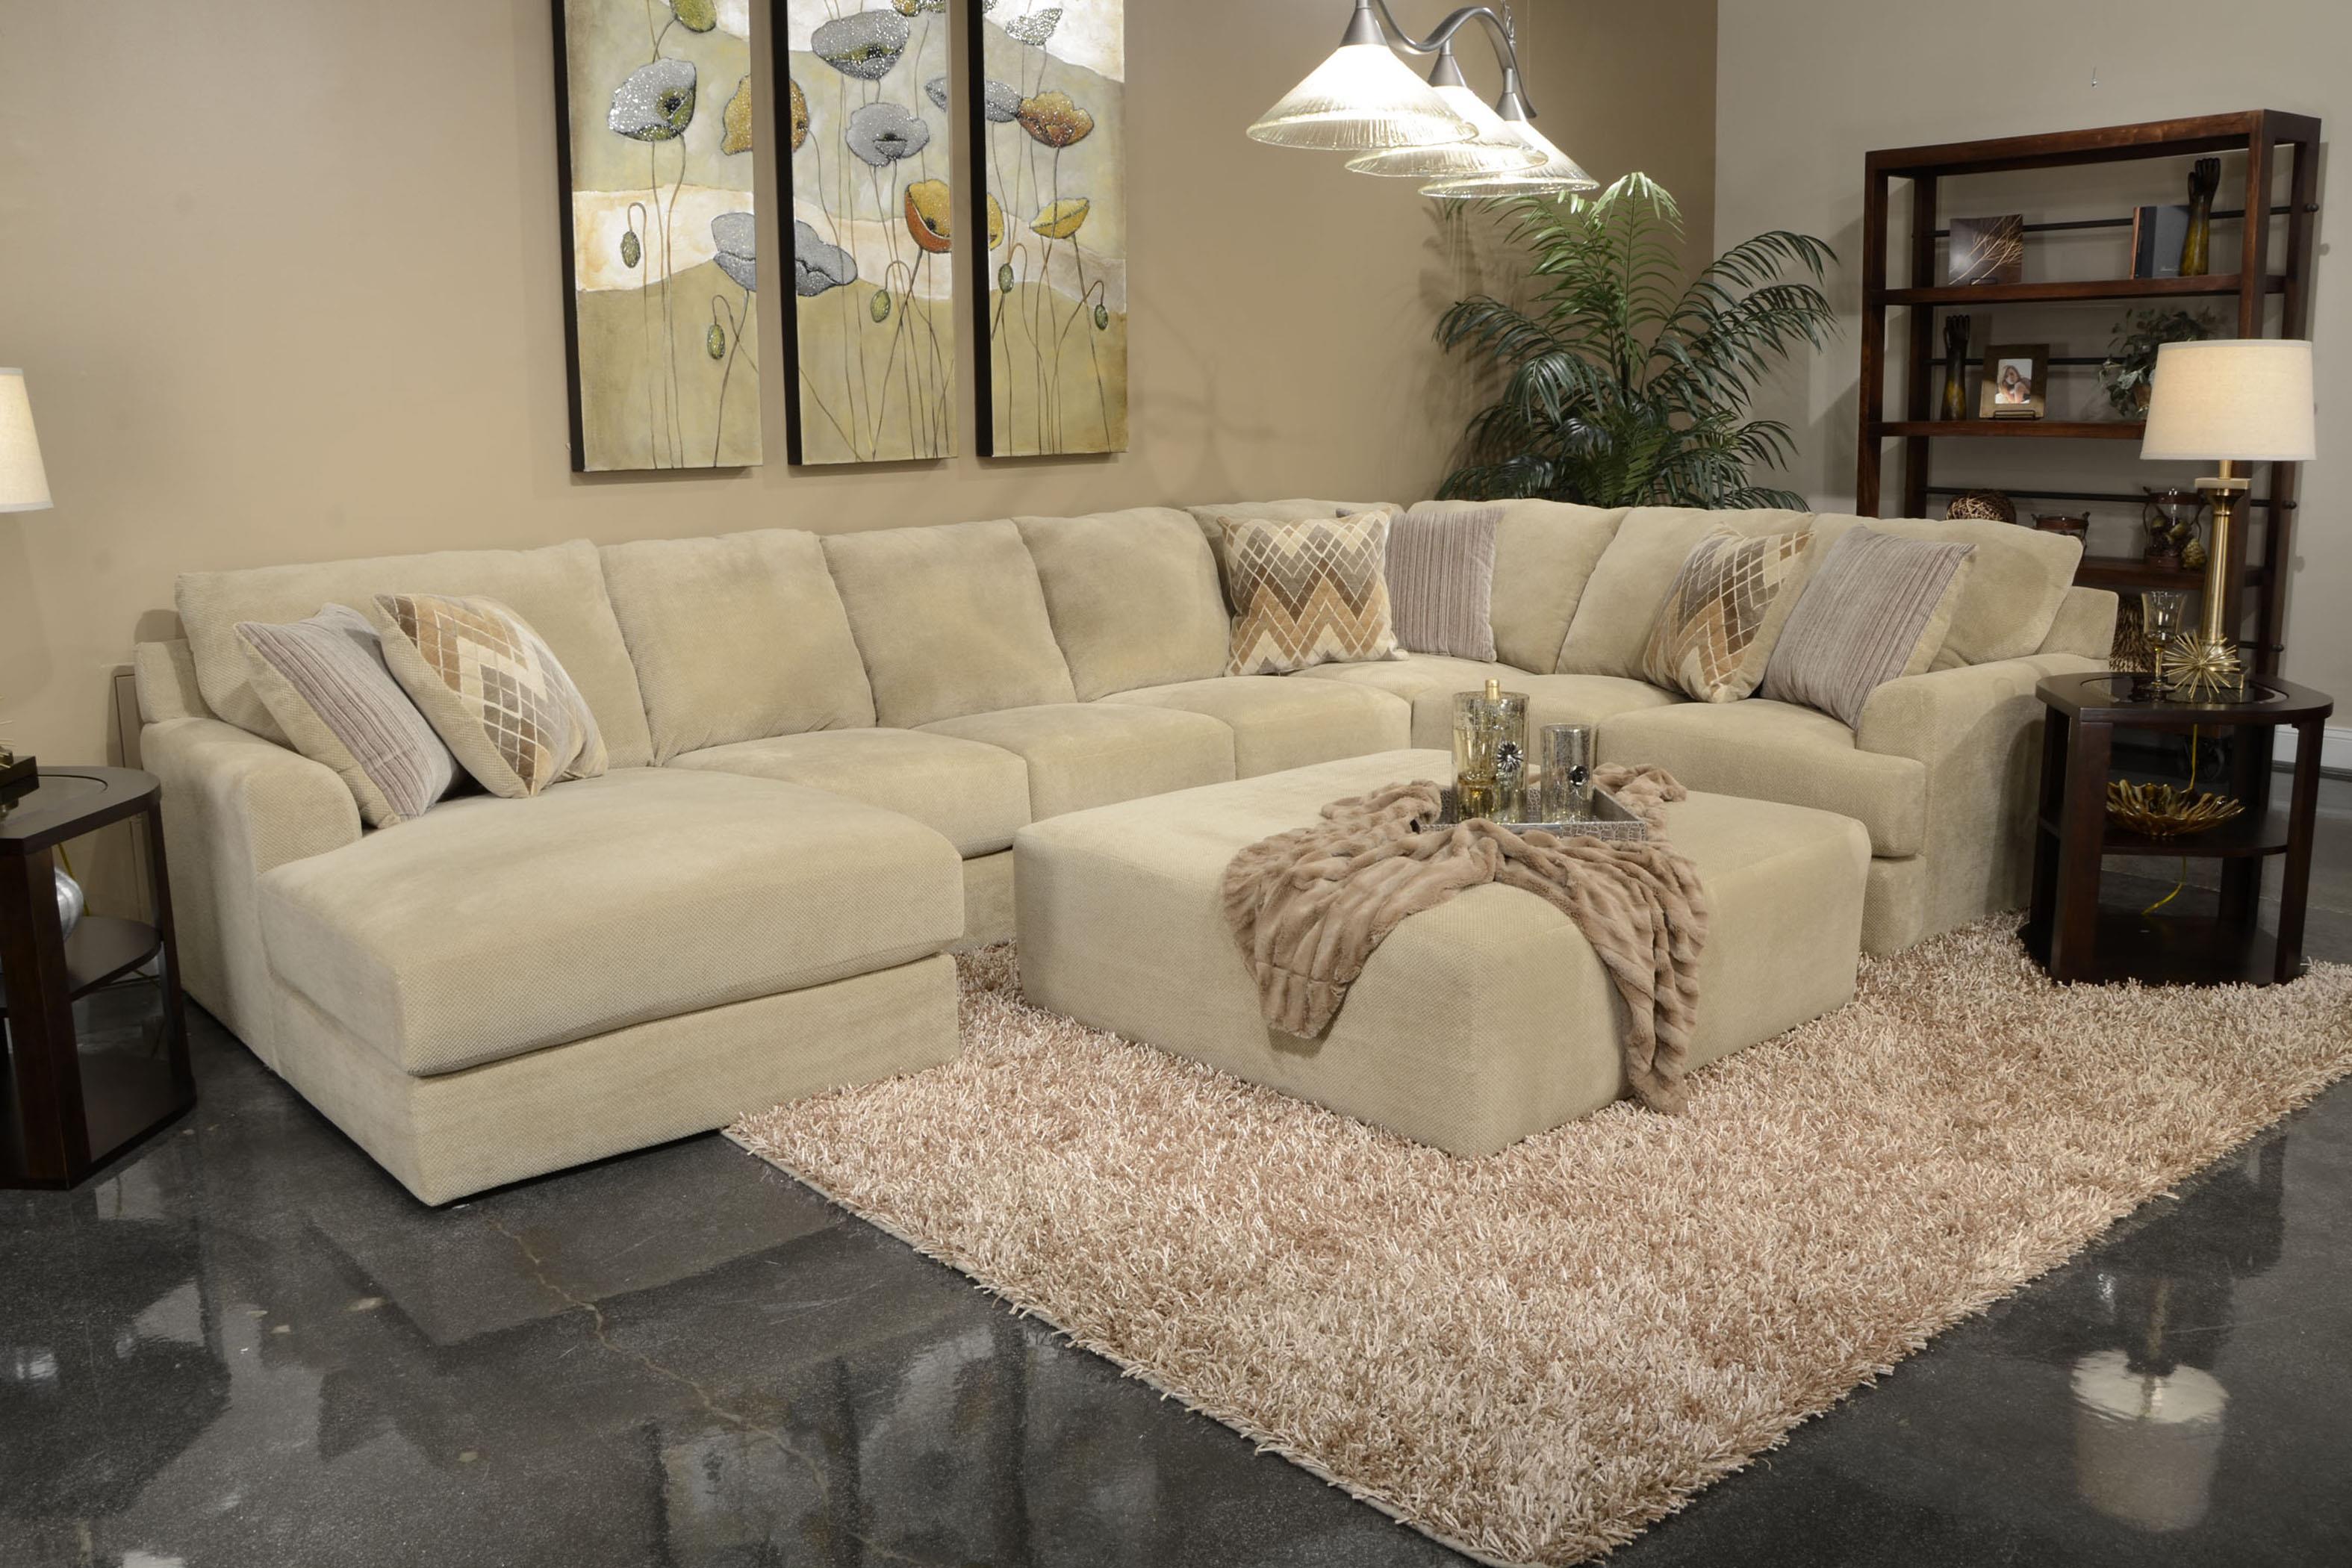 Jackson Furniture Malibu Six Seat Sectional Sofa EFO